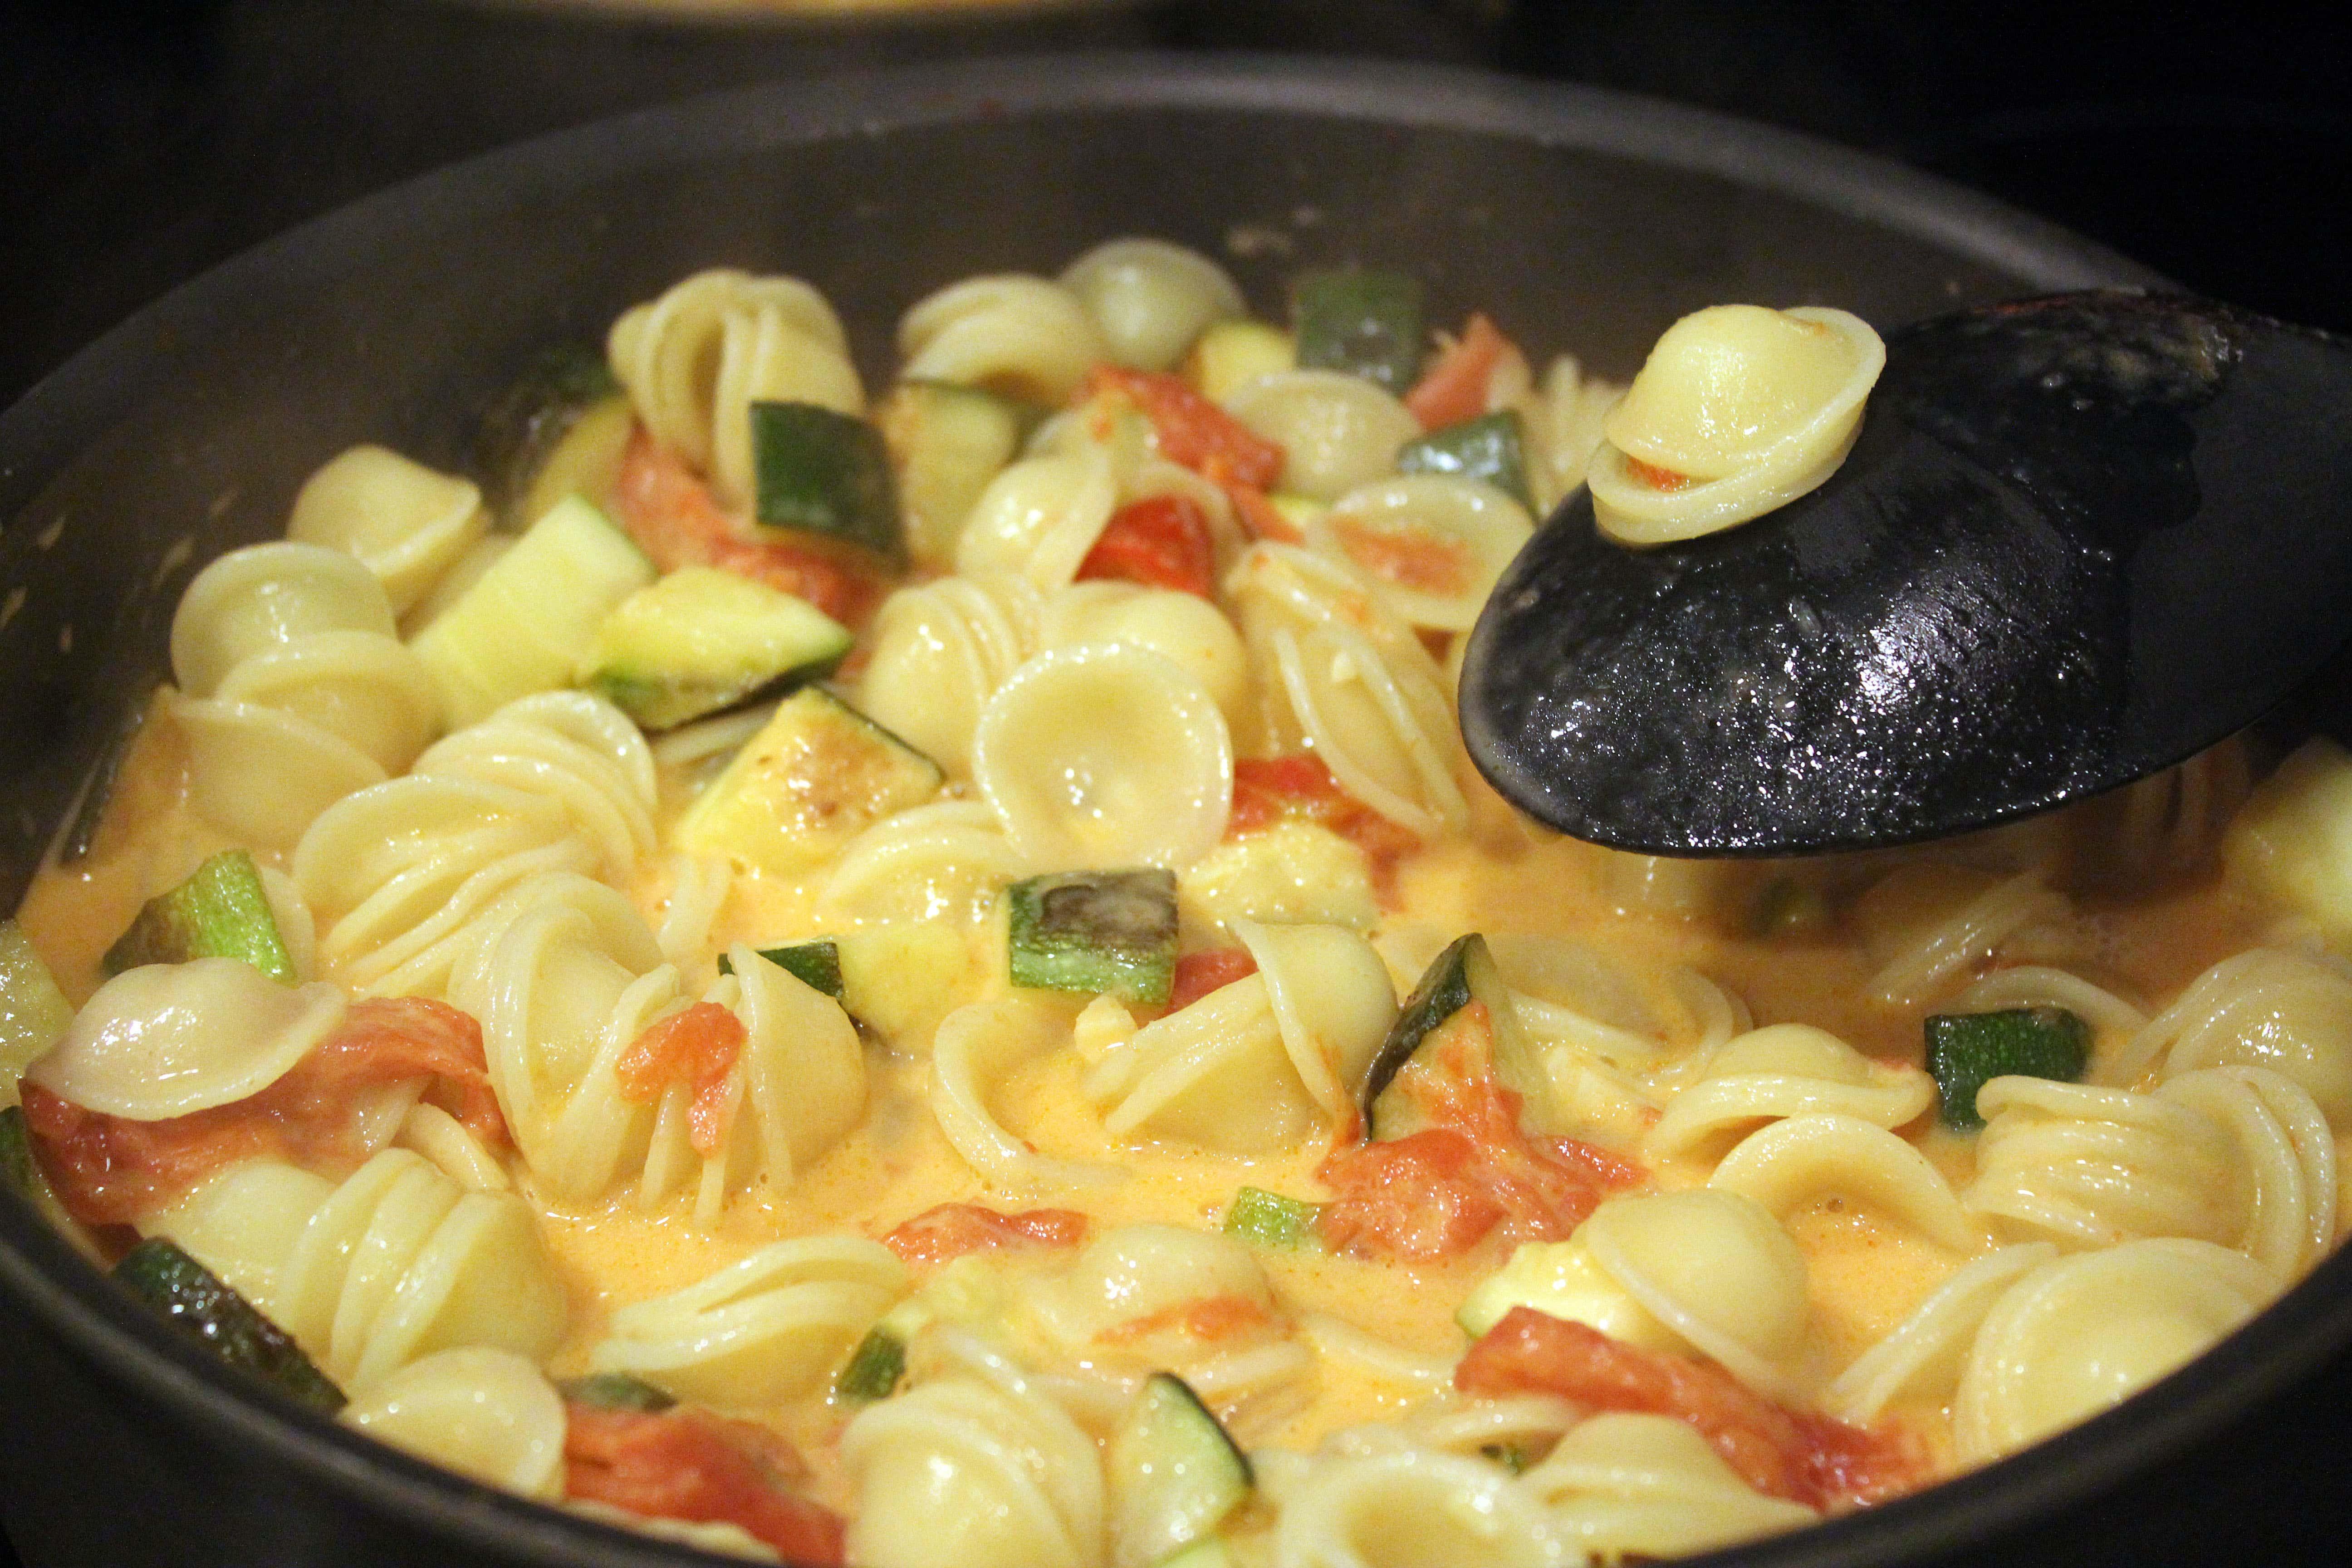 Stir pasta into sauce to coat